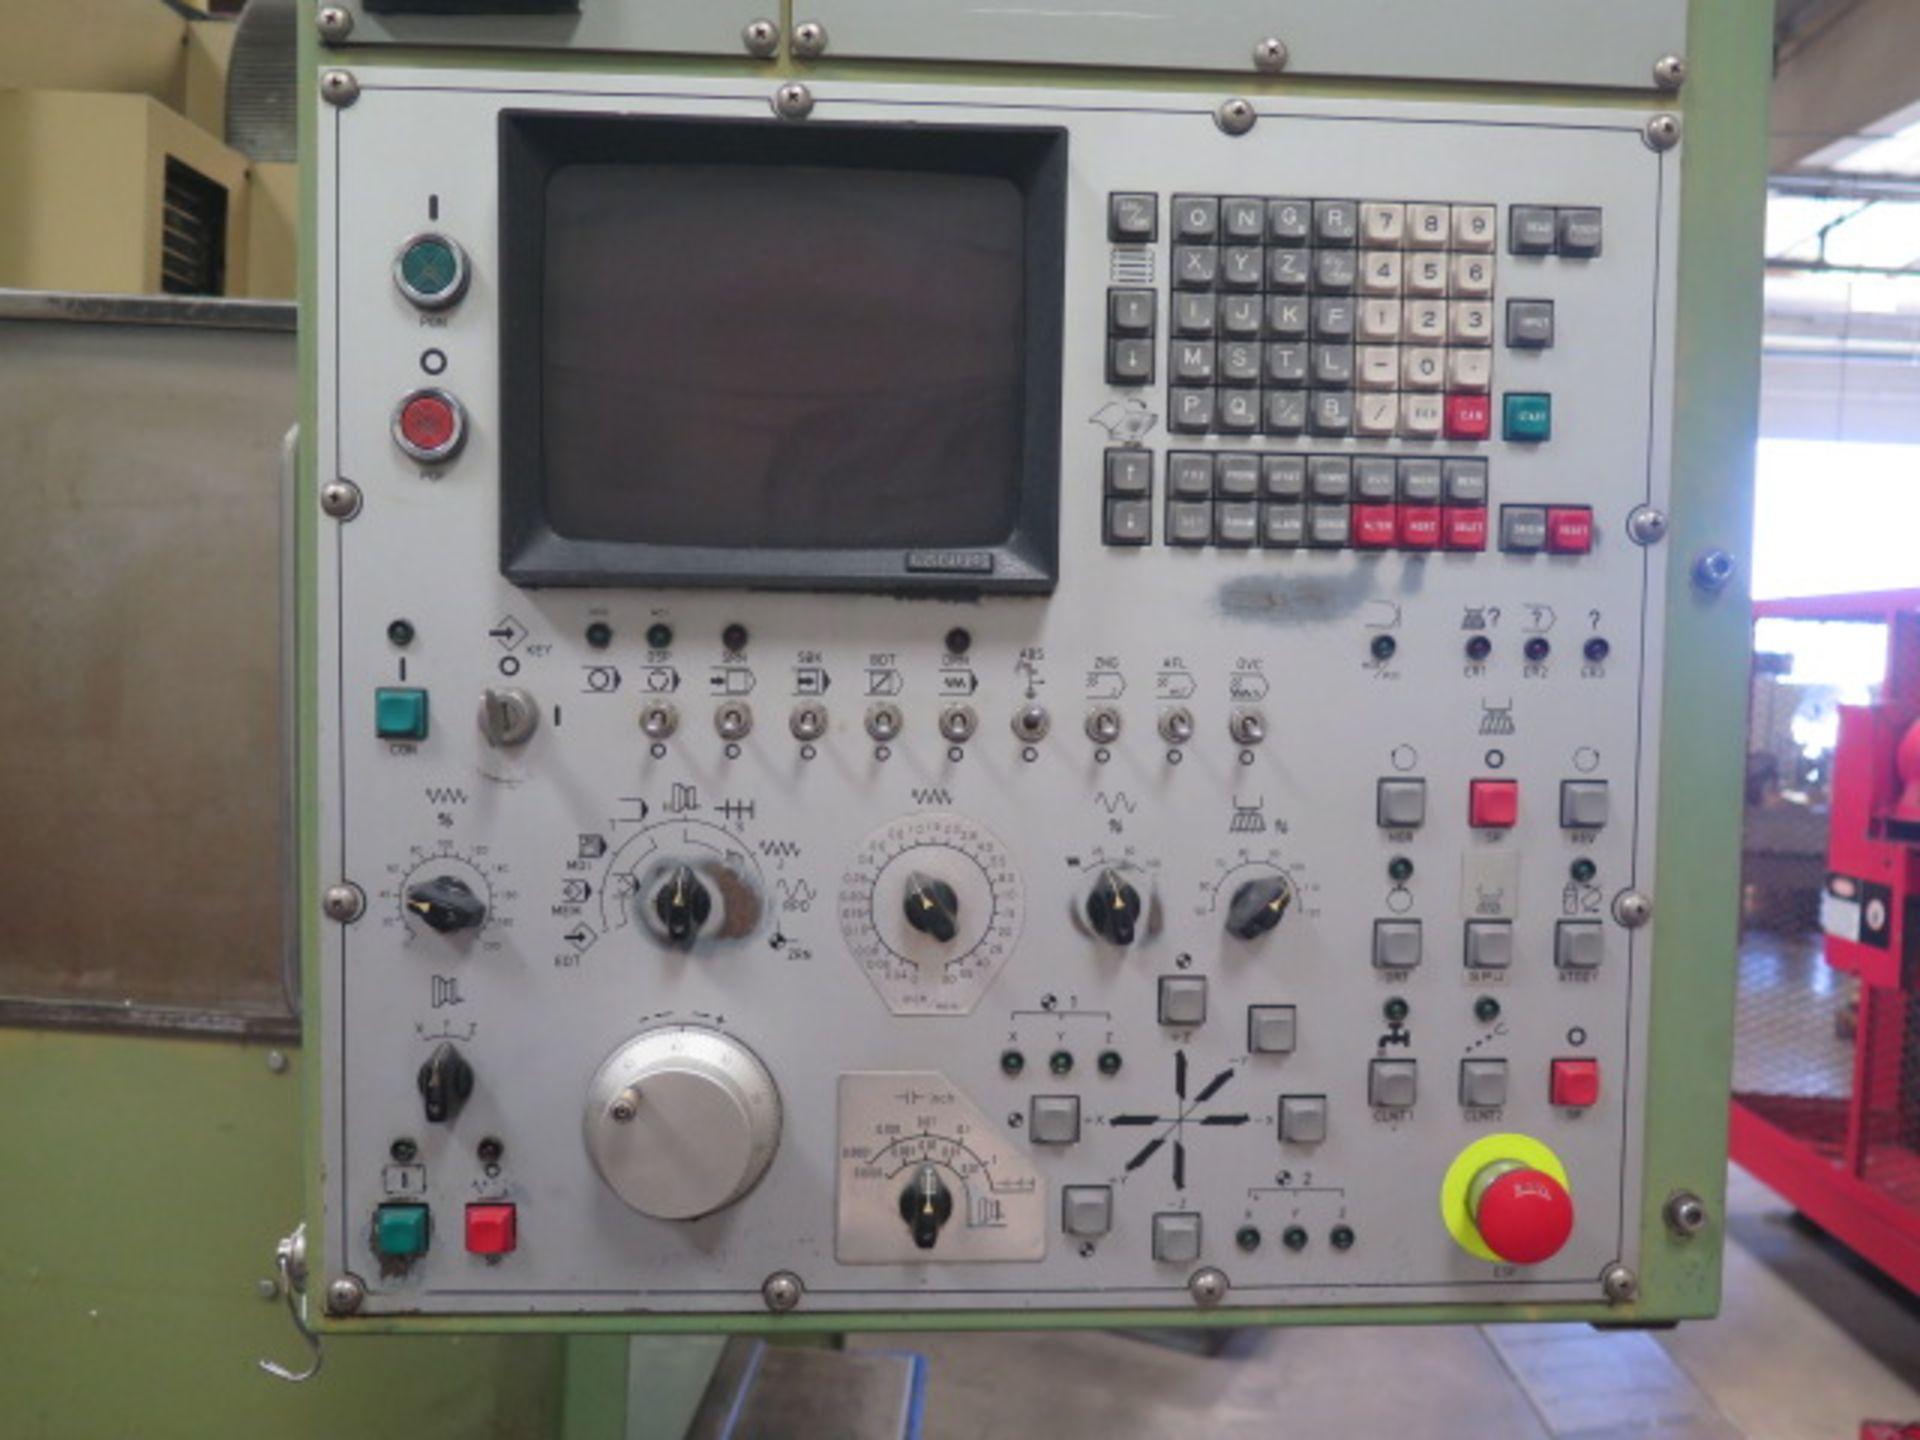 Mori Seiki MV-35/35 CNC VMC s/n 148 w/ Fanuc Controls, 20-Station ATC, BT-35, SOLD AS IS - Image 5 of 14